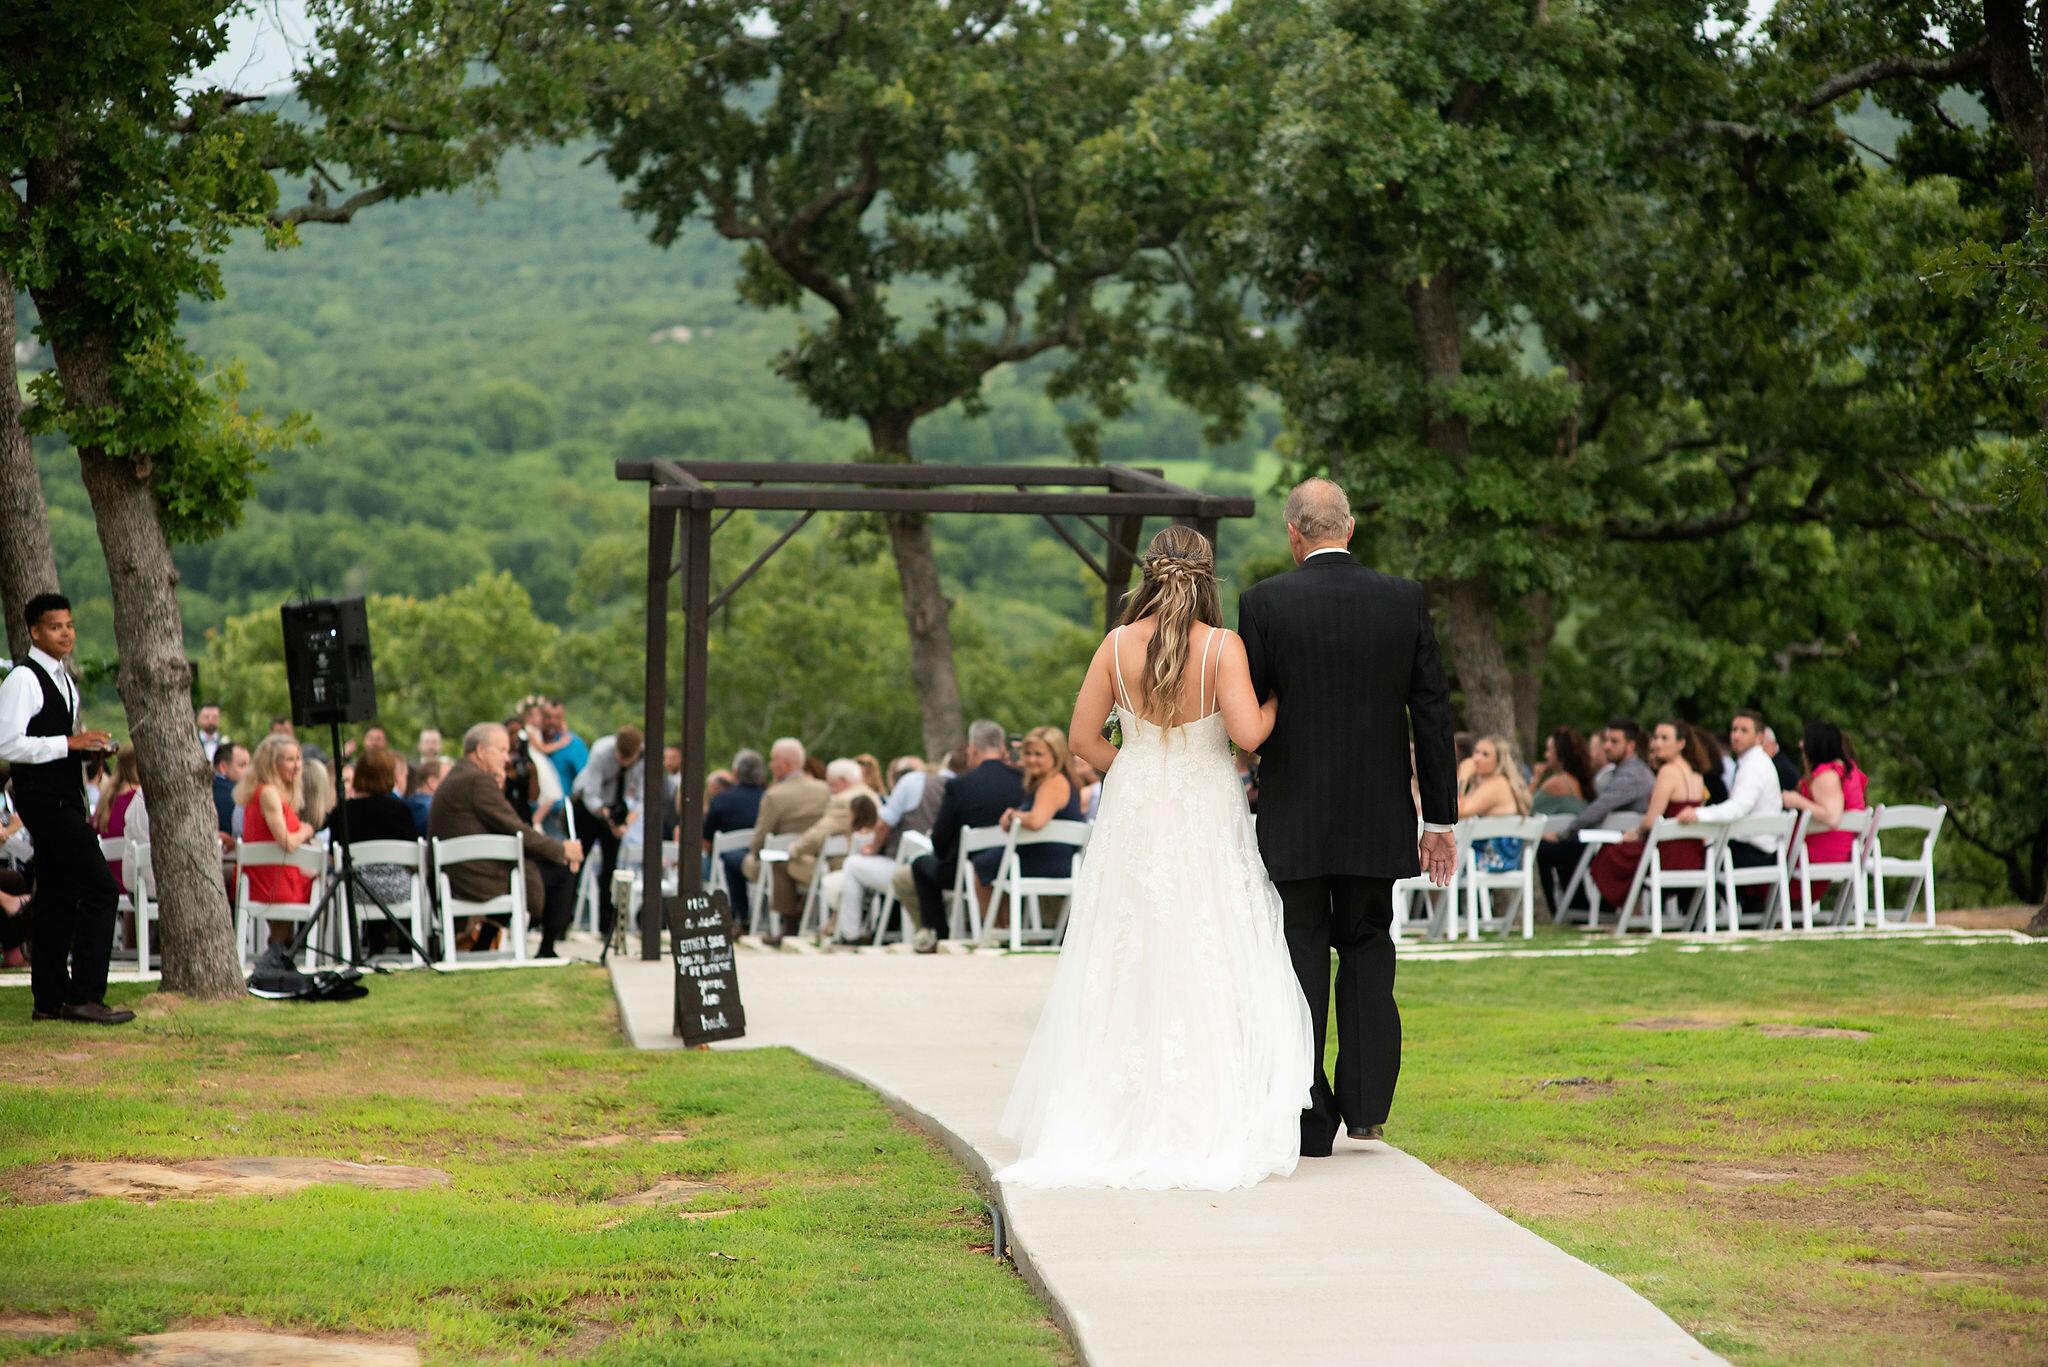 Oklahoma Summer Wedding Venue Dream Point Ranch 27.jpg